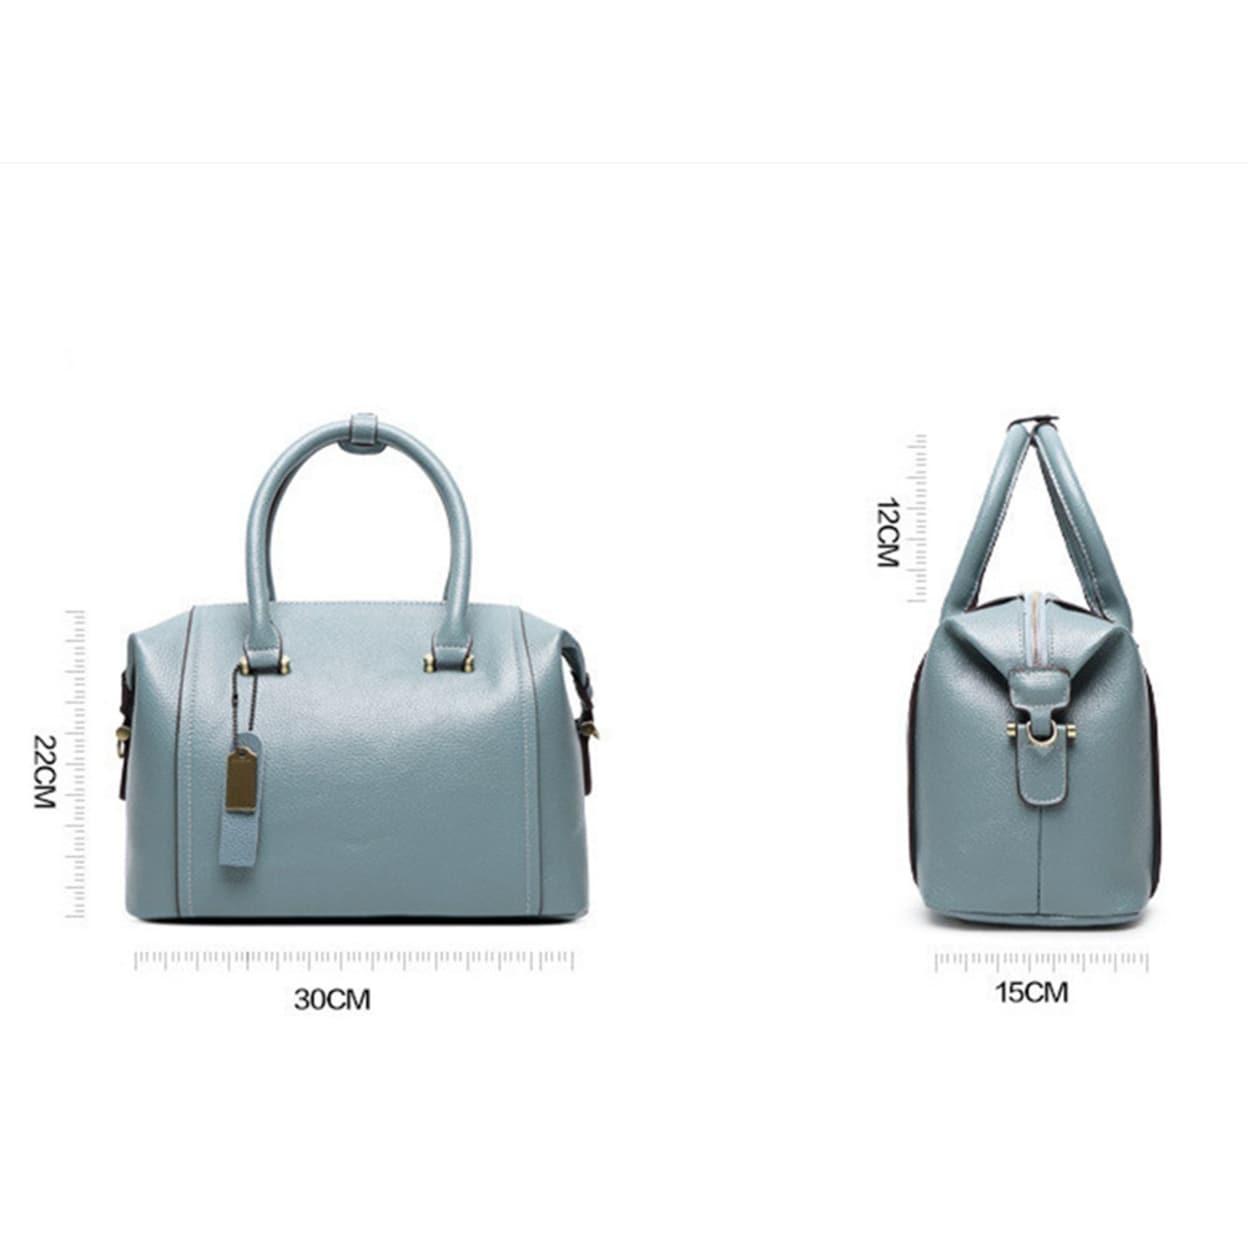 fe88352d41 Shop Women Handbags Pillow Package Messenger Bag - Free Shipping Today -  Overstock - 22807304